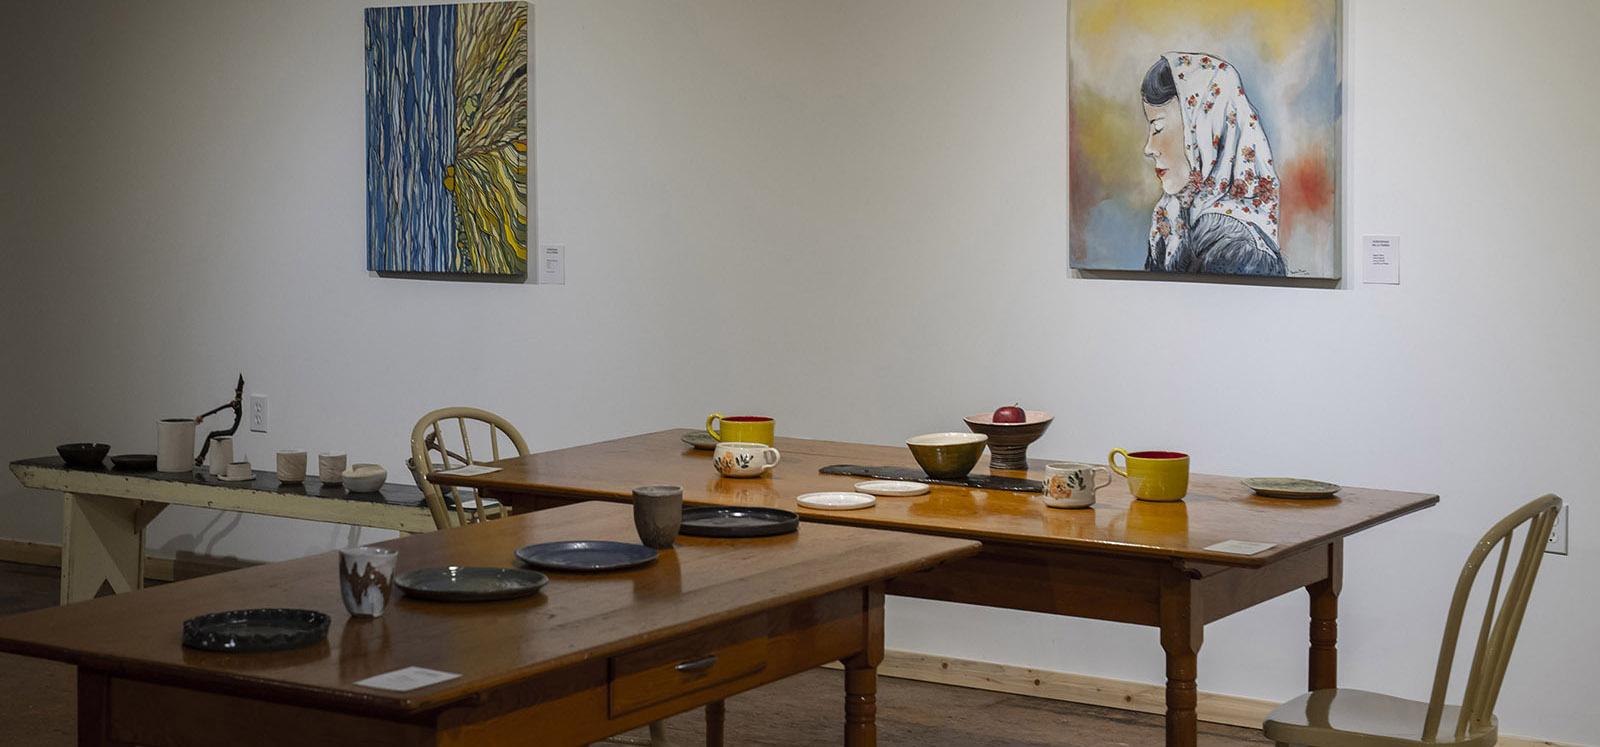 Exposición conceptual menonita chihuahua